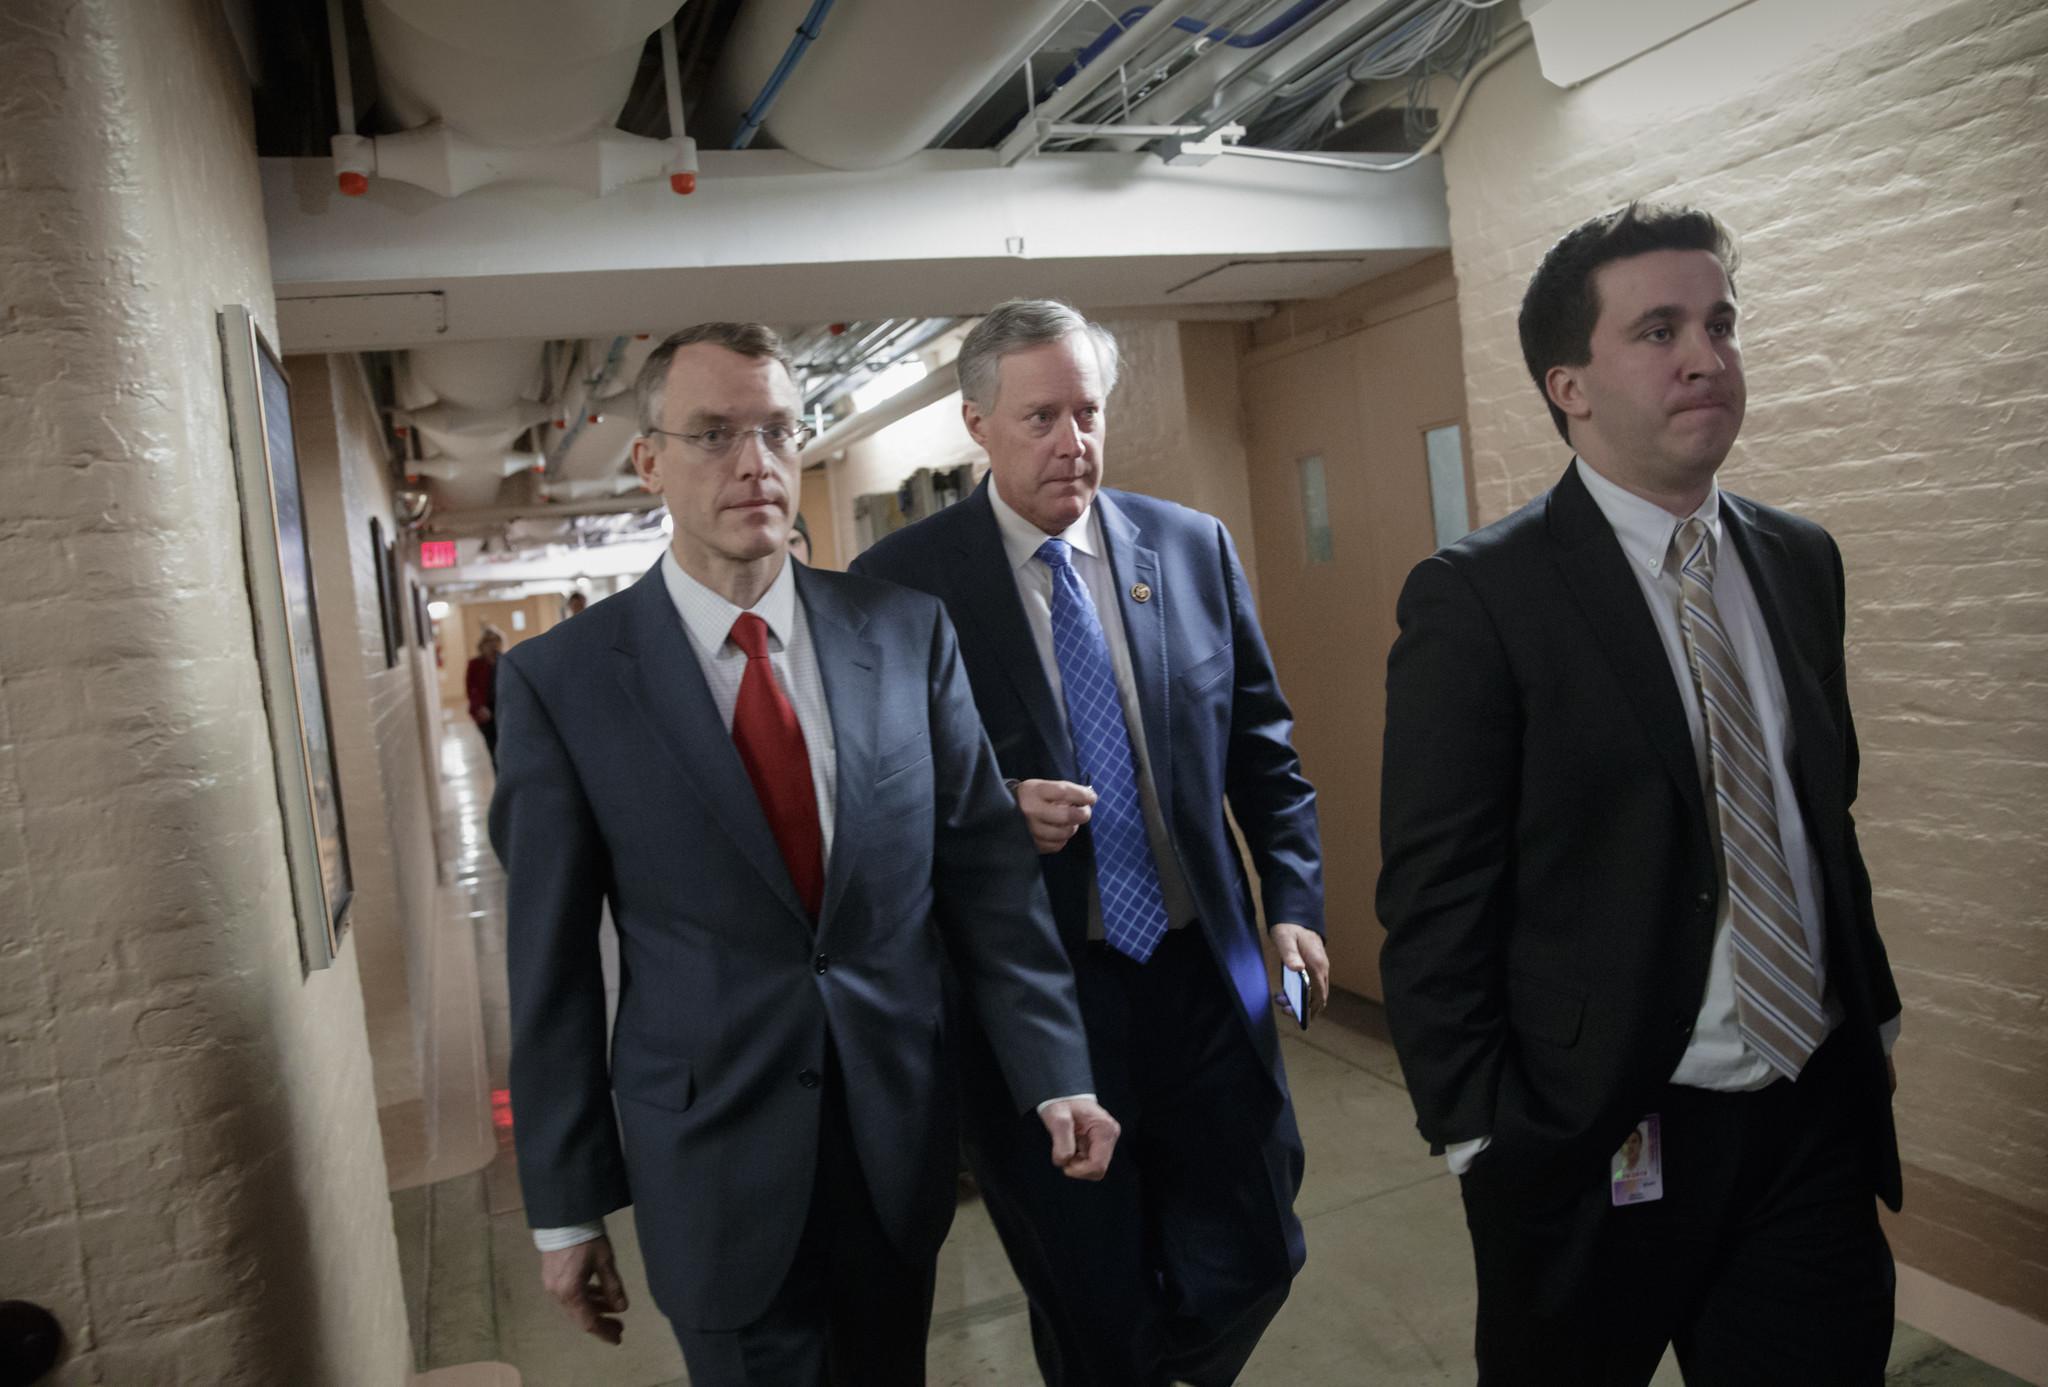 sfl-understanding-freedom-caucus.jpg